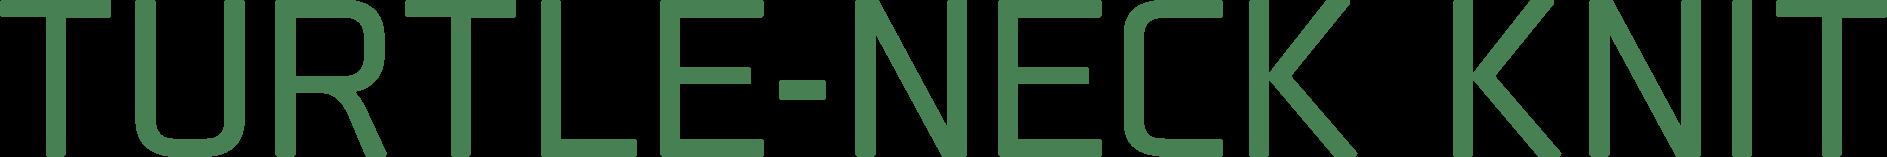 TURTLE-NECK KNIT